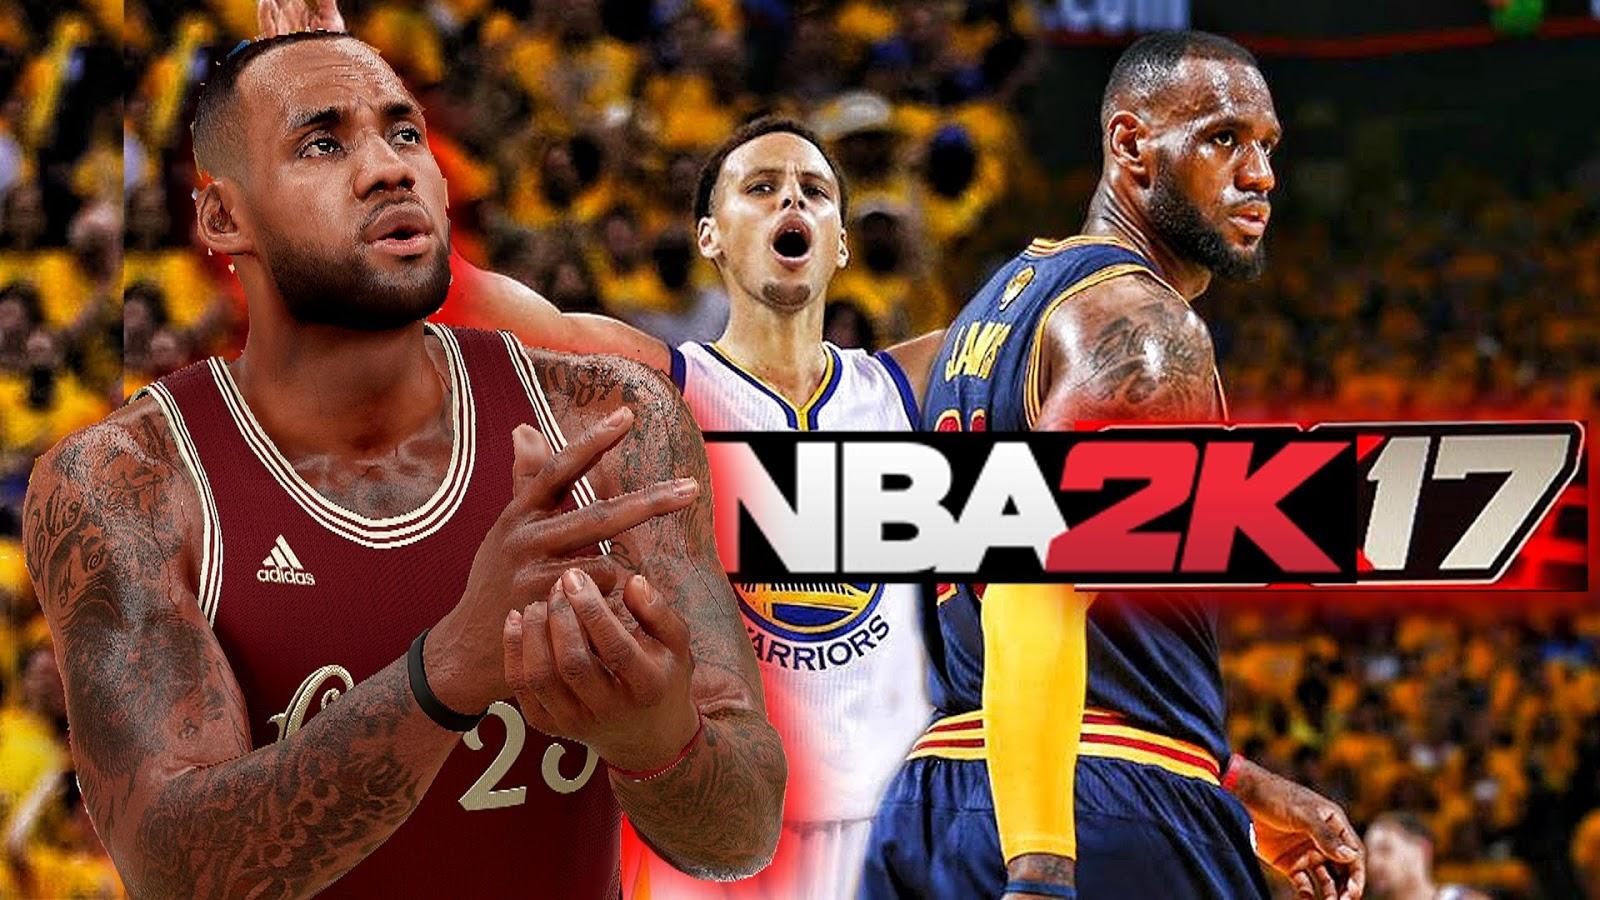 Nba 2k17 Wallpapers: NBA 2K17 Xbox 360 Download Full Version Game